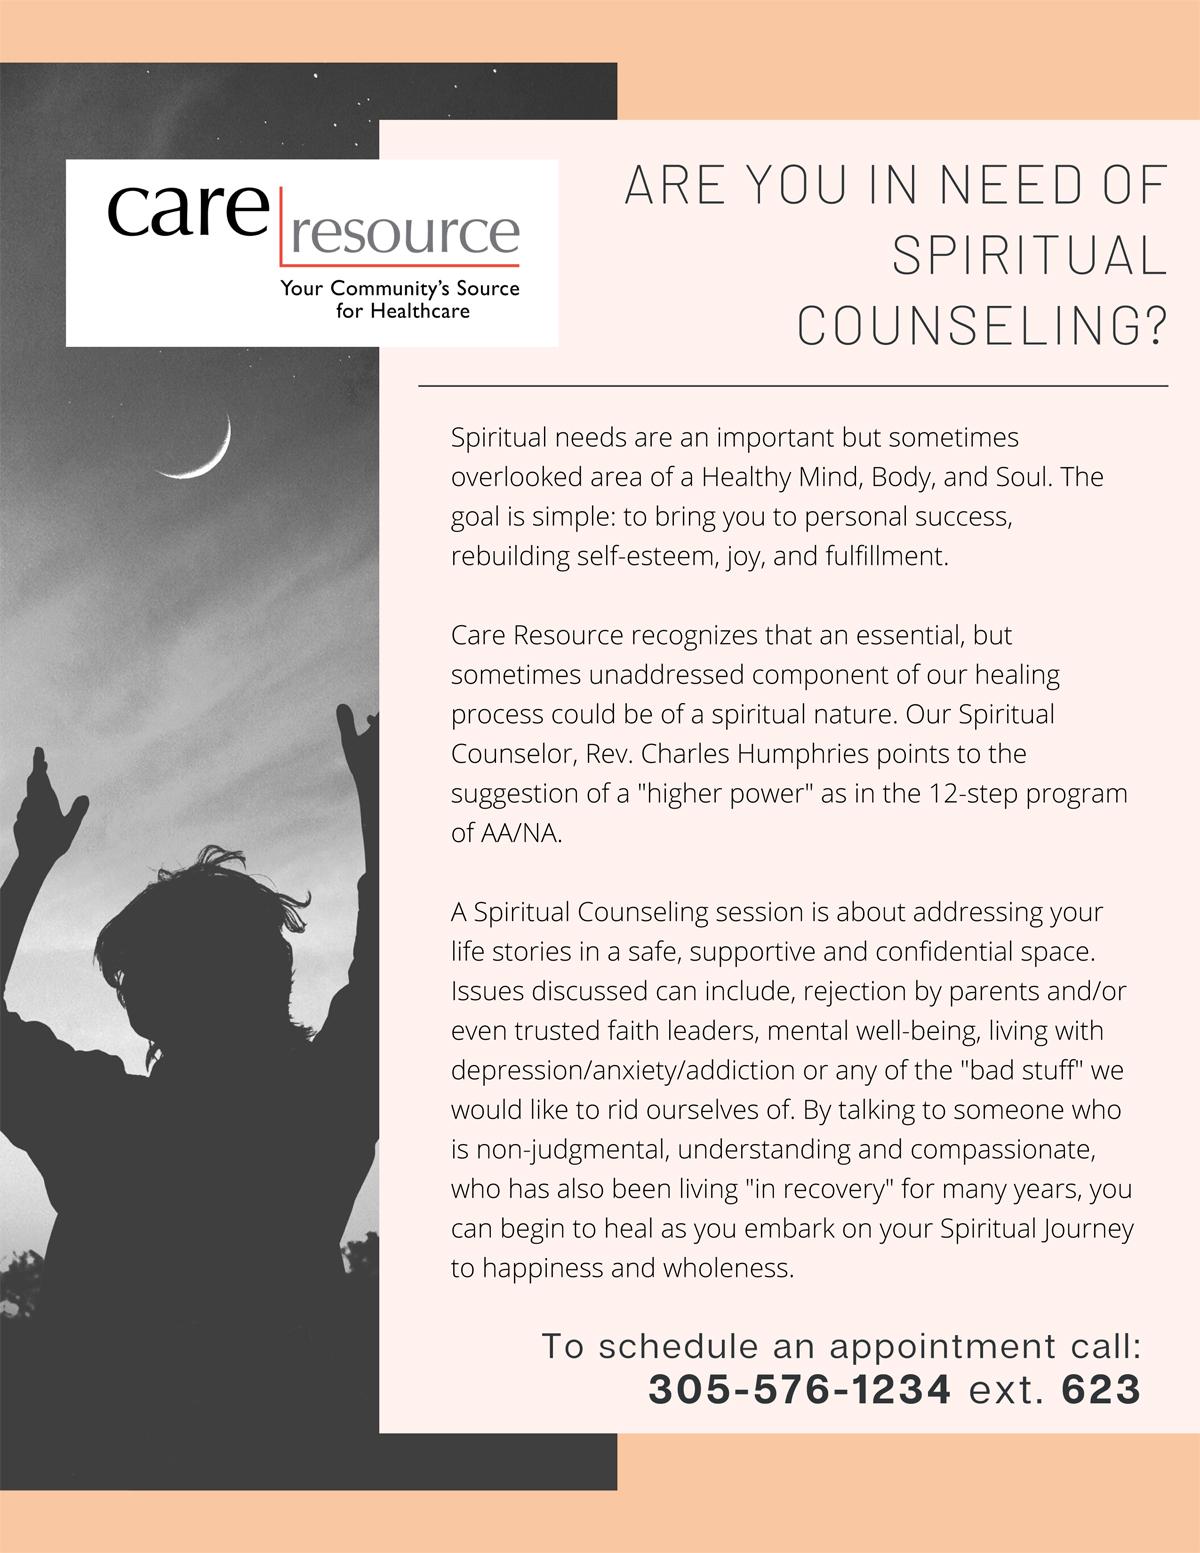 Séance de counseling spirituel